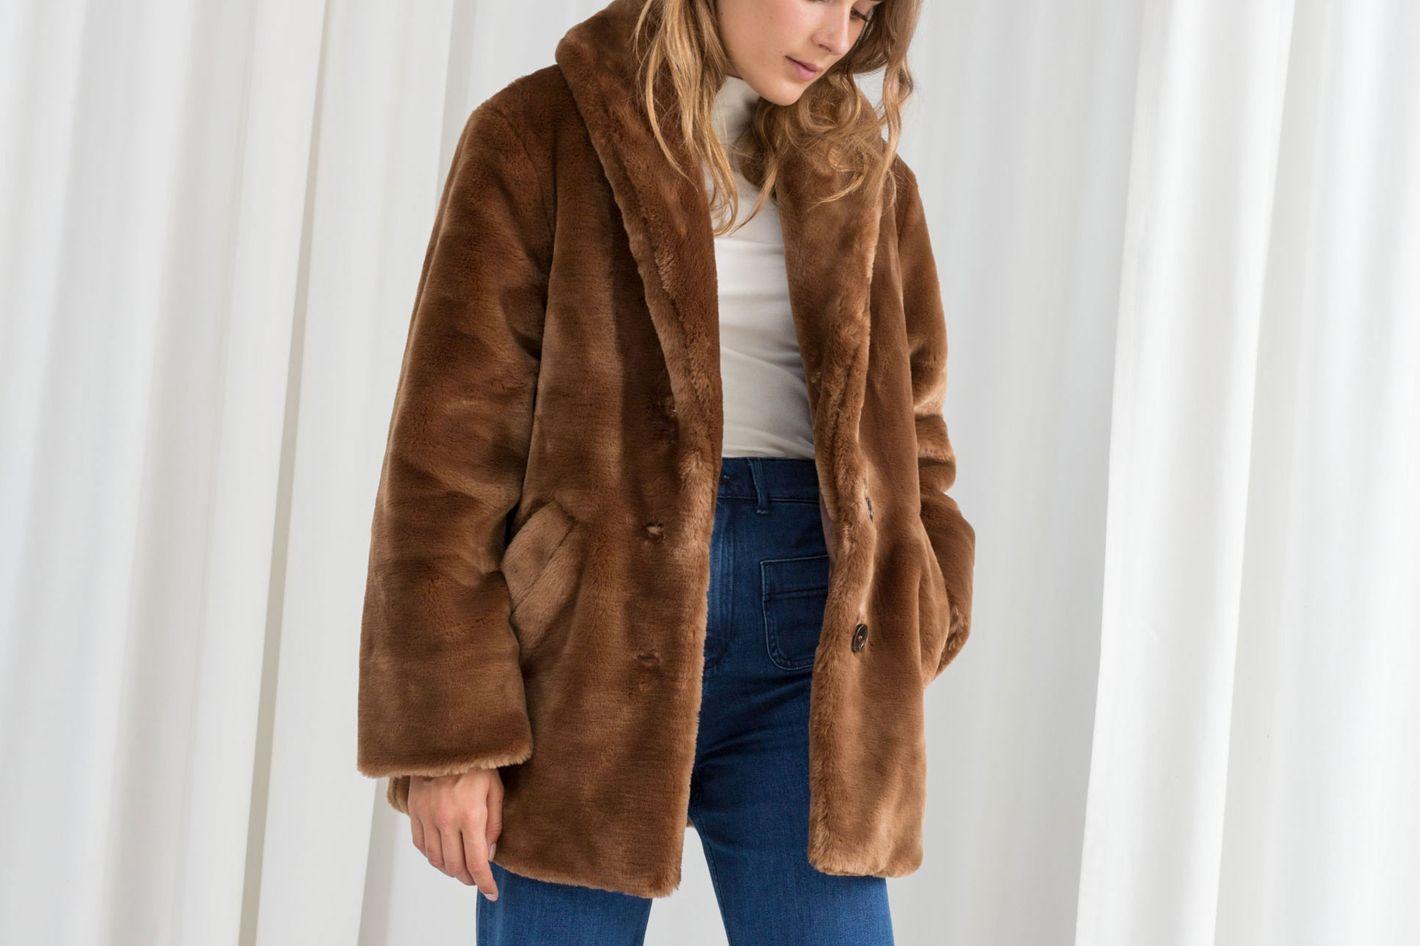 15 Best Teddy Bear Coats 2018